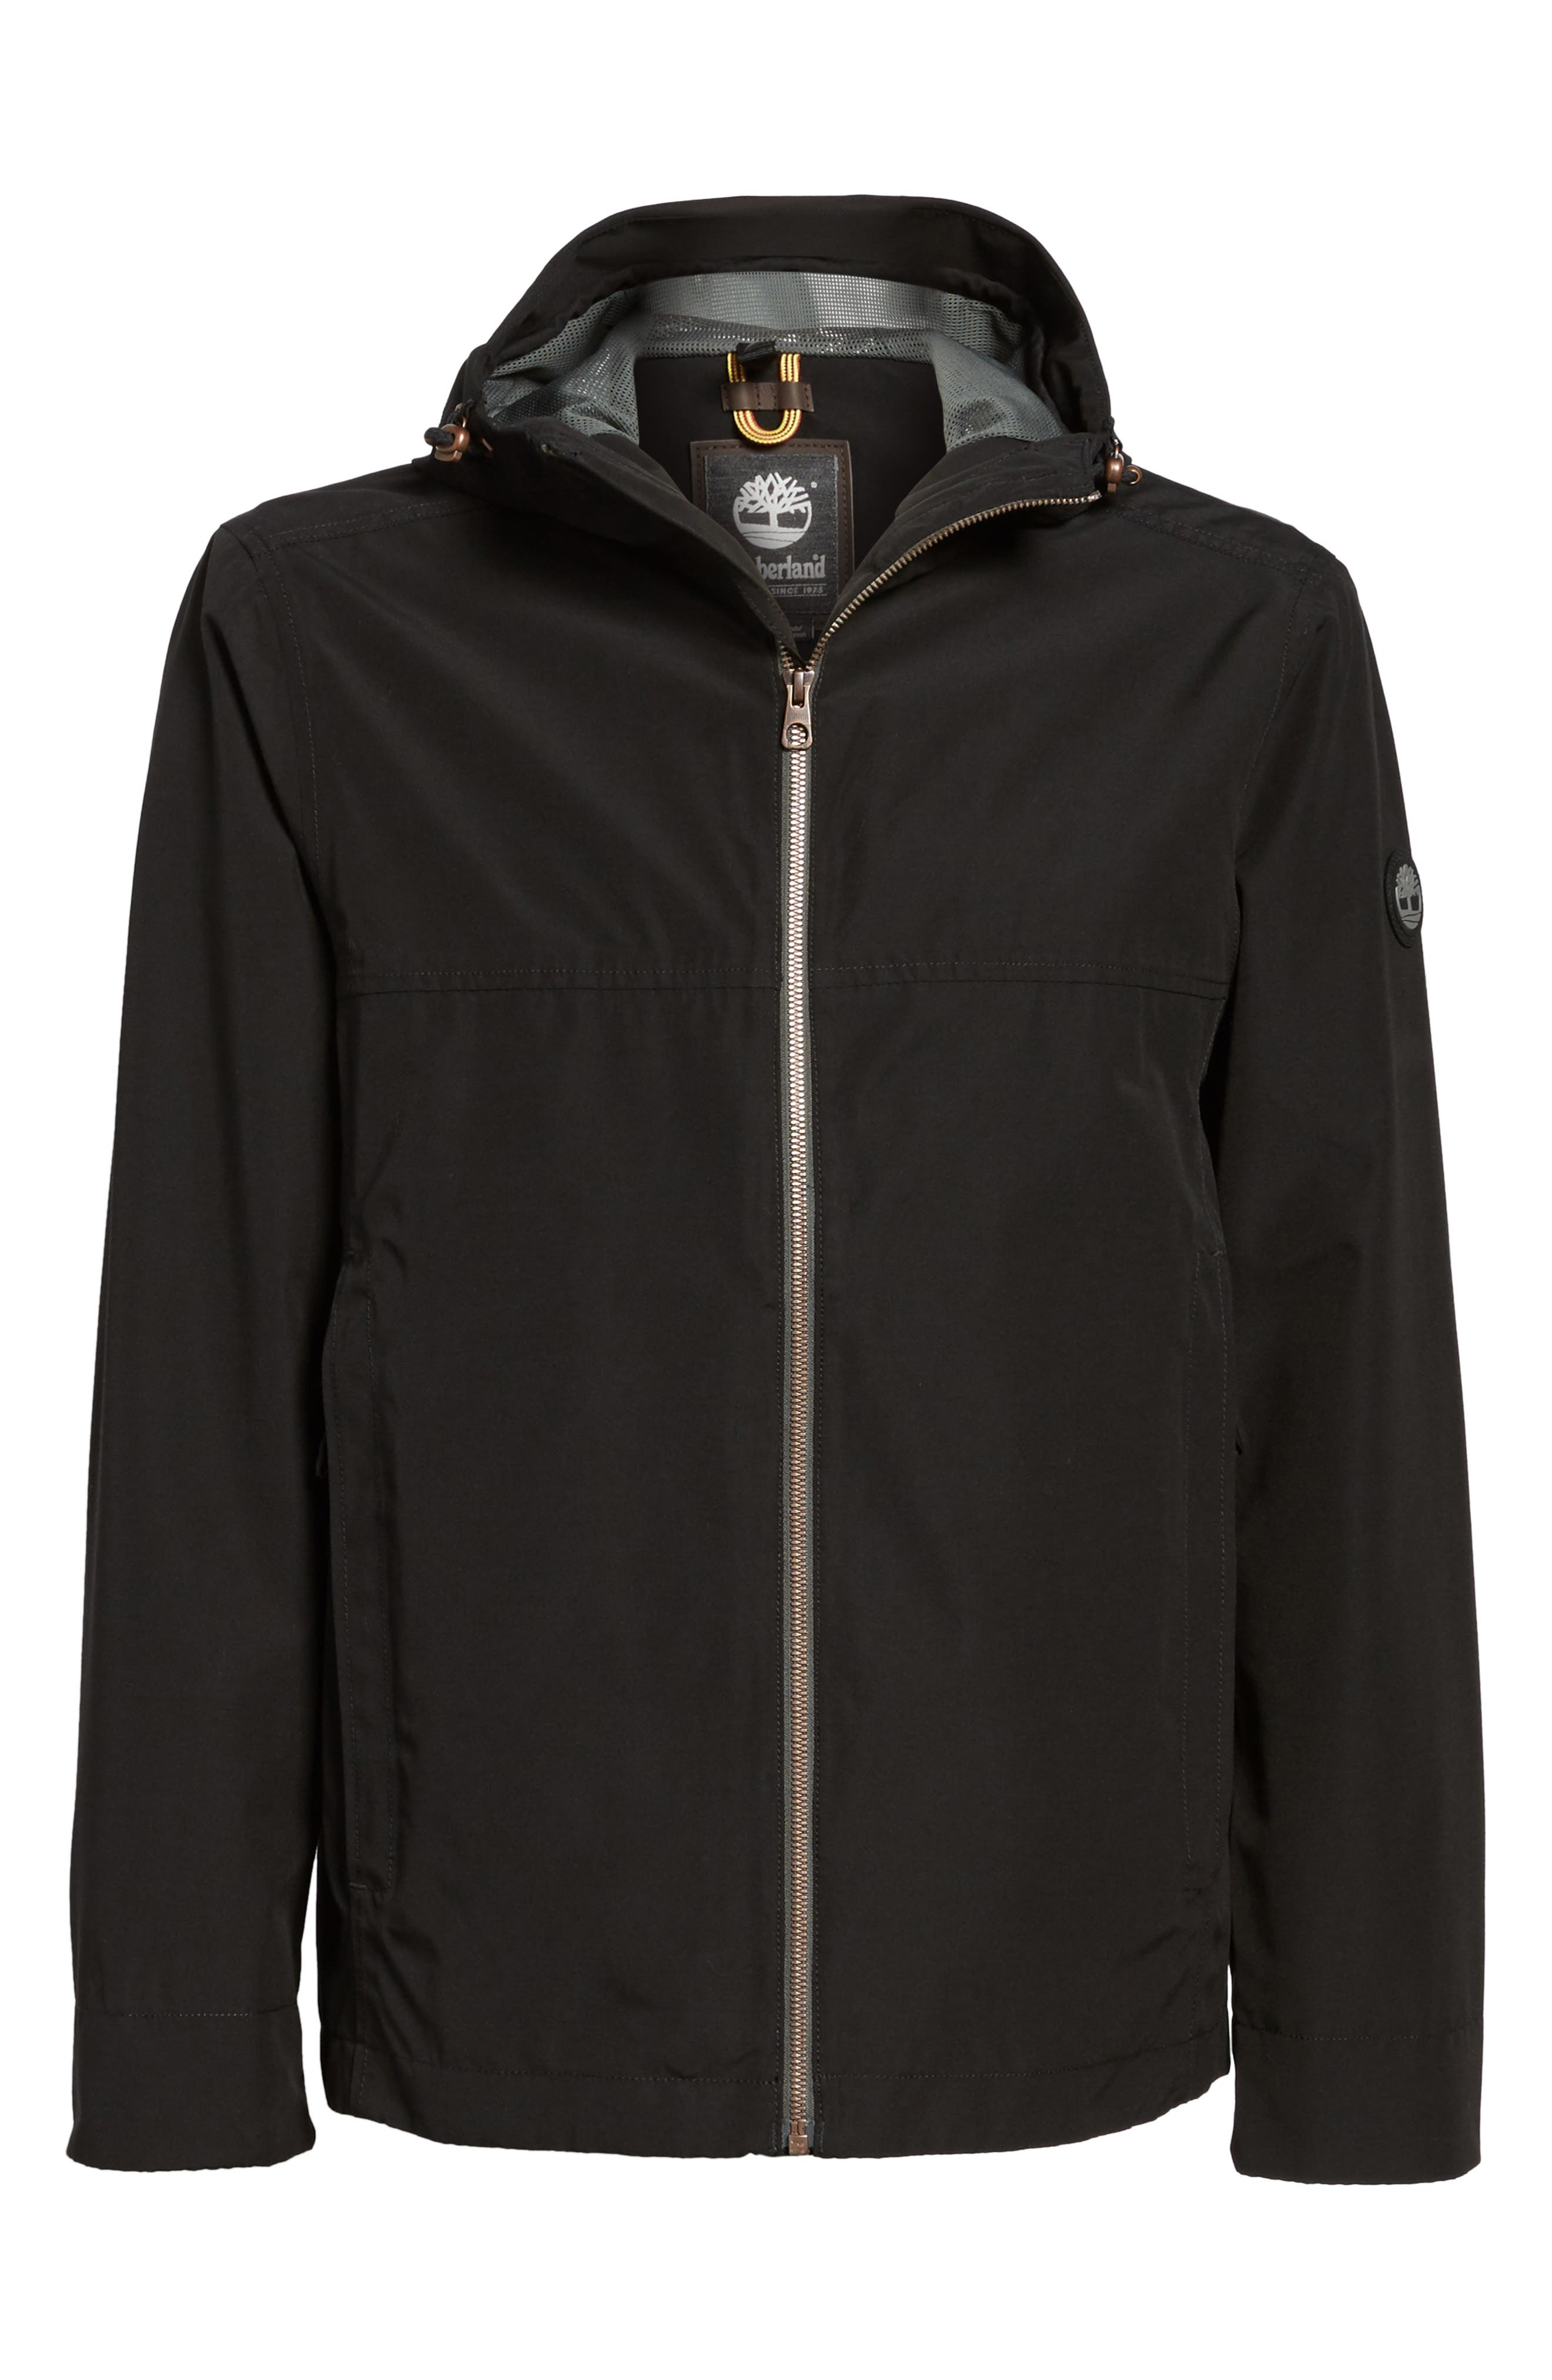 Ragged Mountain Packable Waterproof Jacket,                             Alternate thumbnail 5, color,                             001